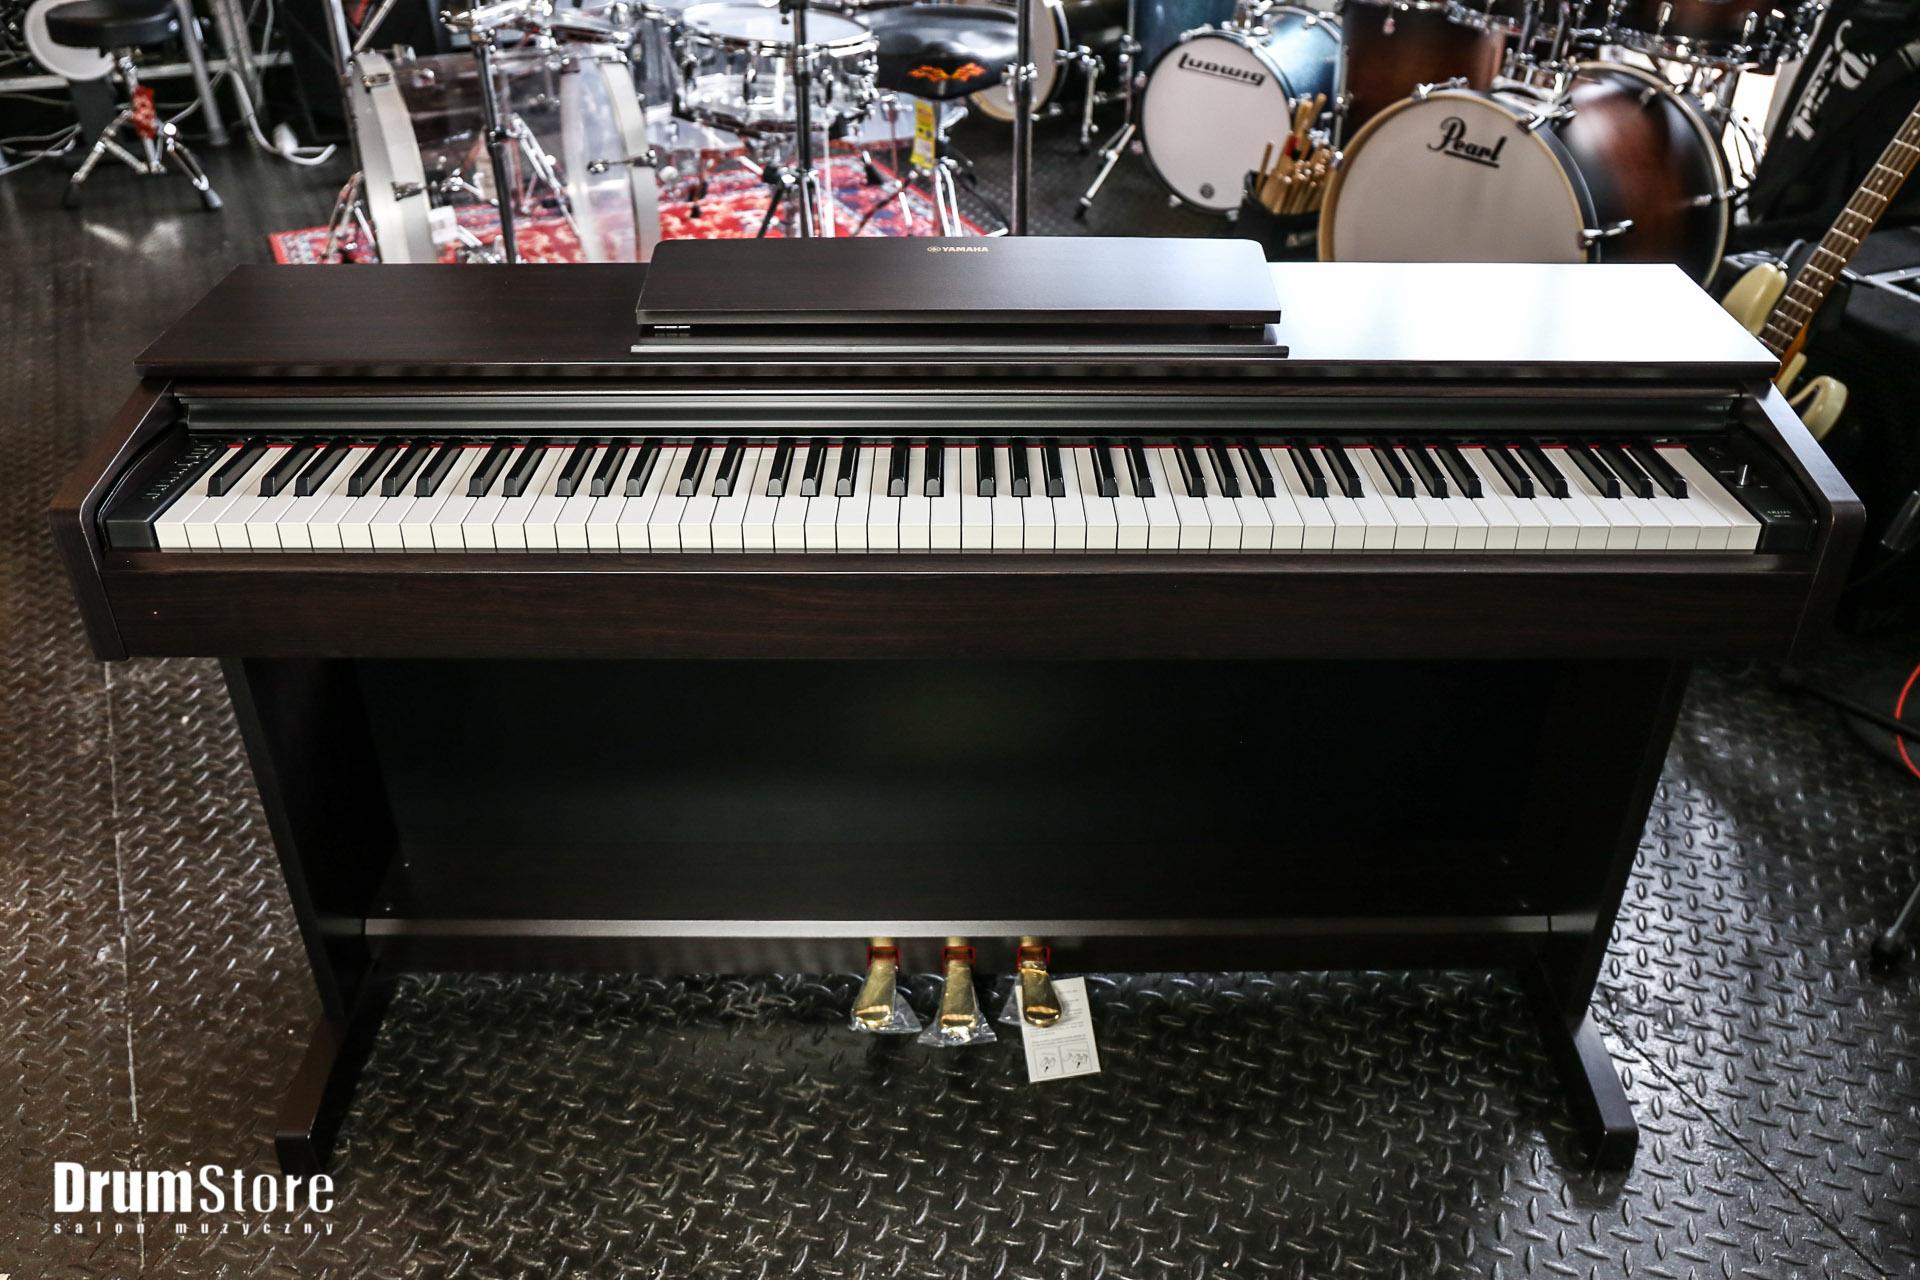 blog pianostore instrumenty klawiszowe pianina cyfrowe. Black Bedroom Furniture Sets. Home Design Ideas